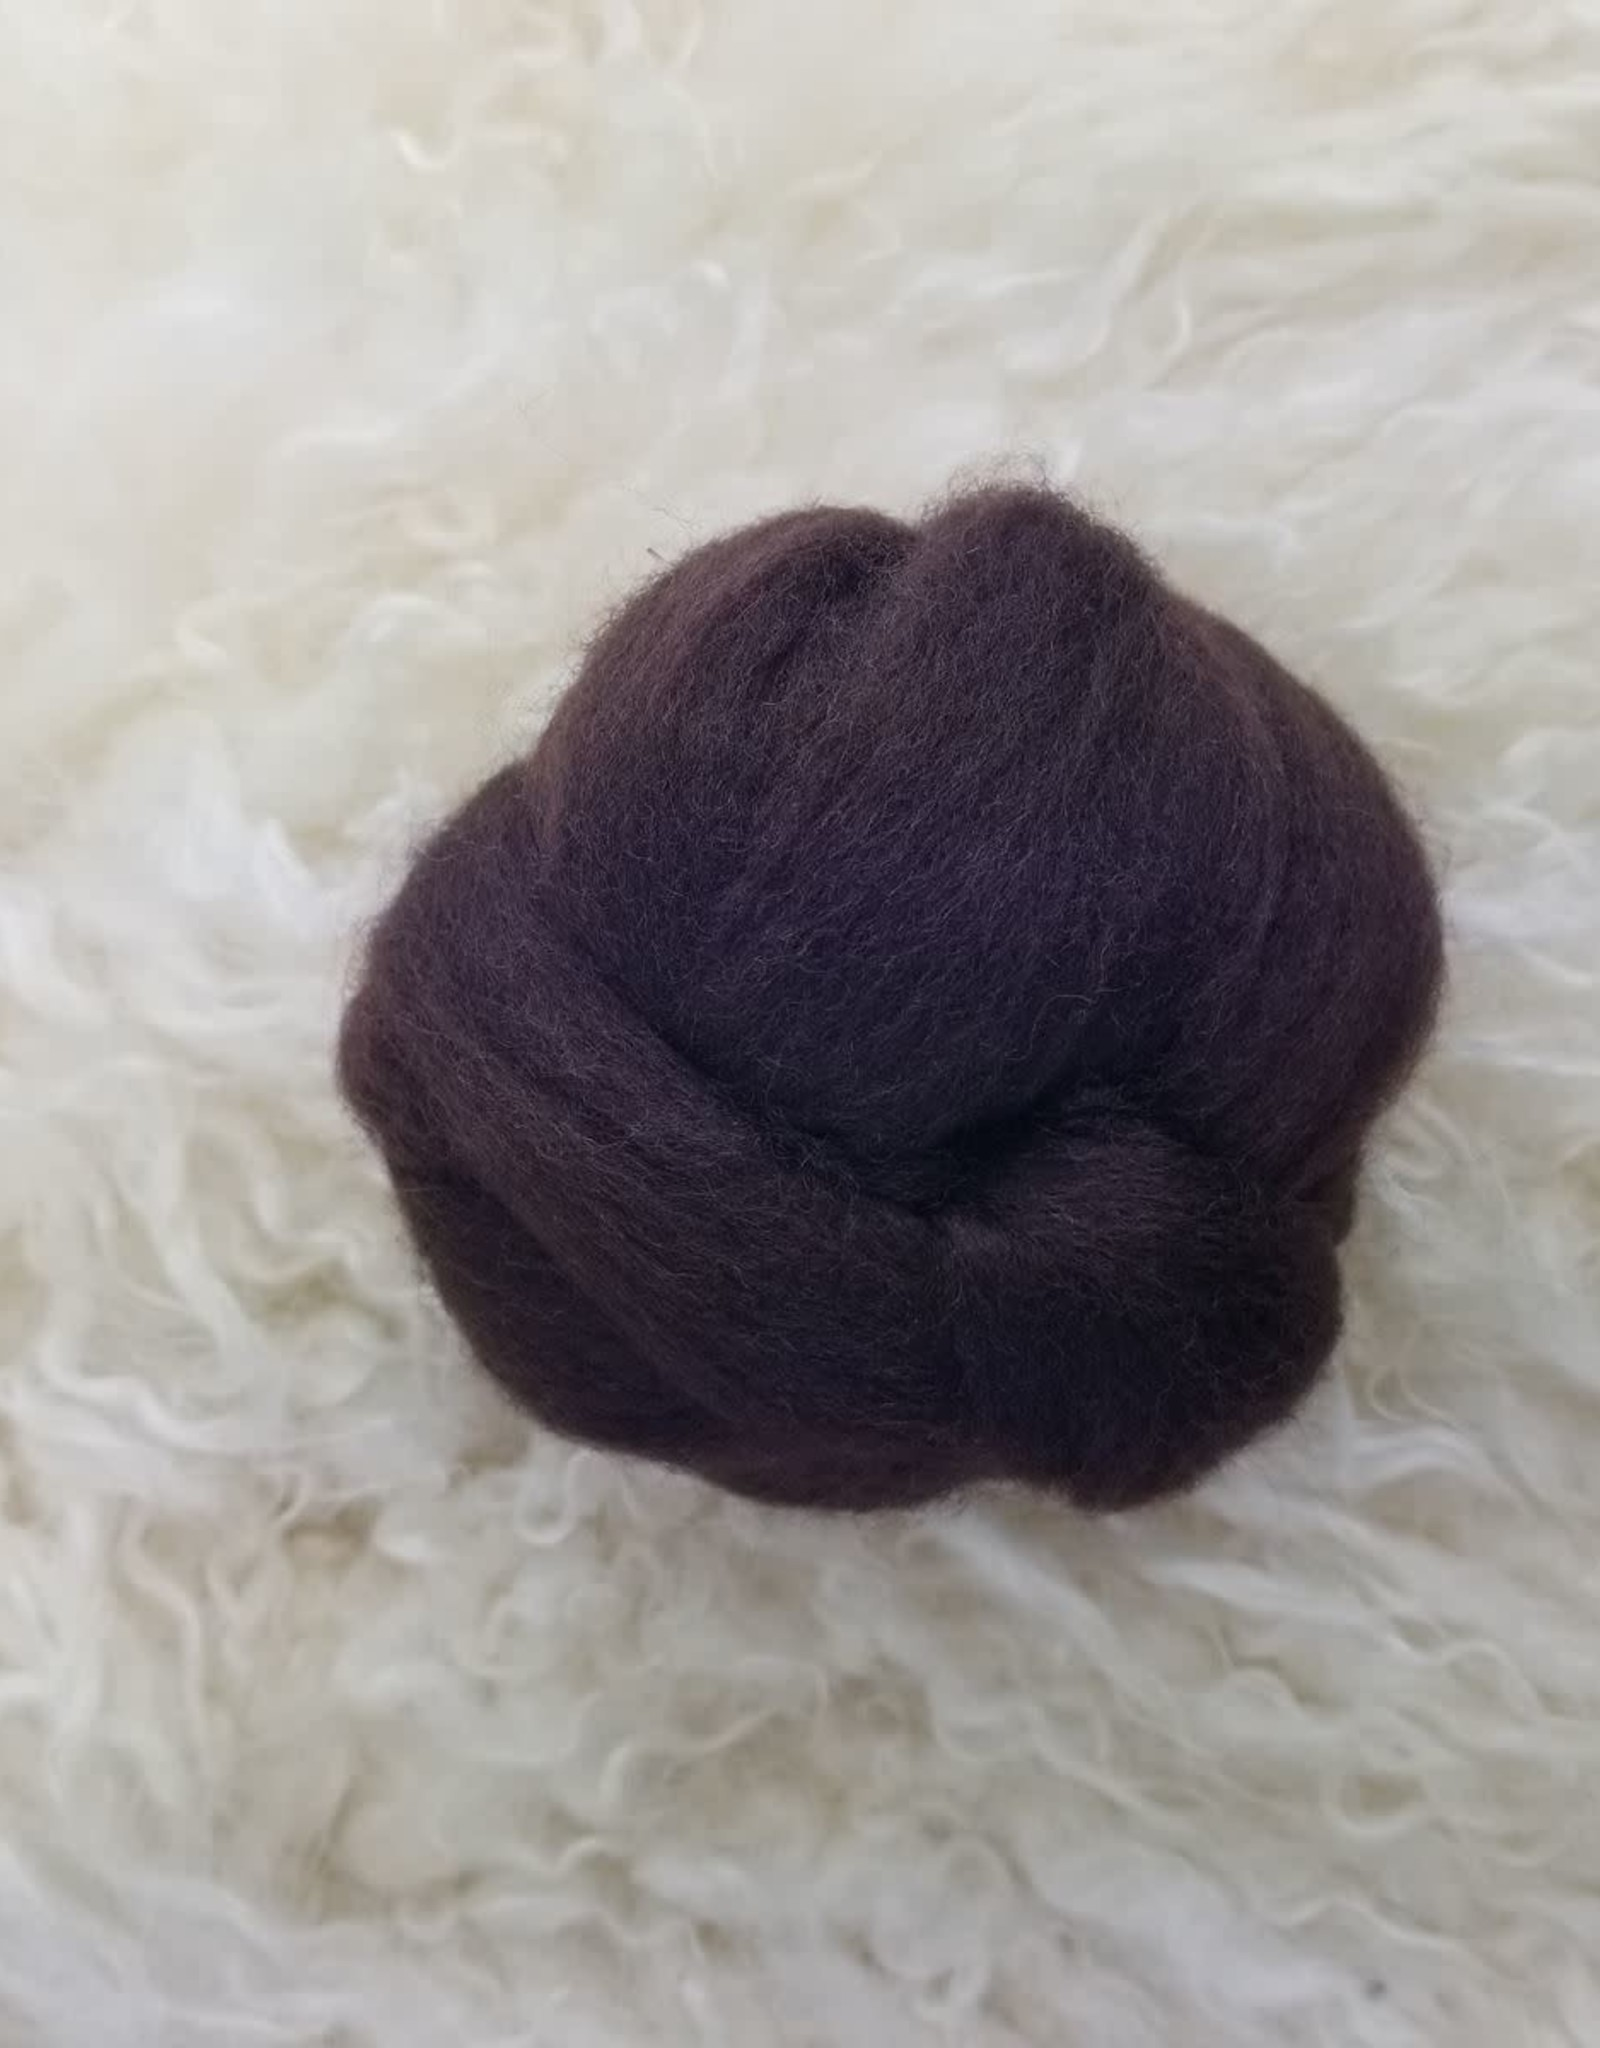 Ashford Fiber Corriedale 2oz Dyed Chocolate combed sliver